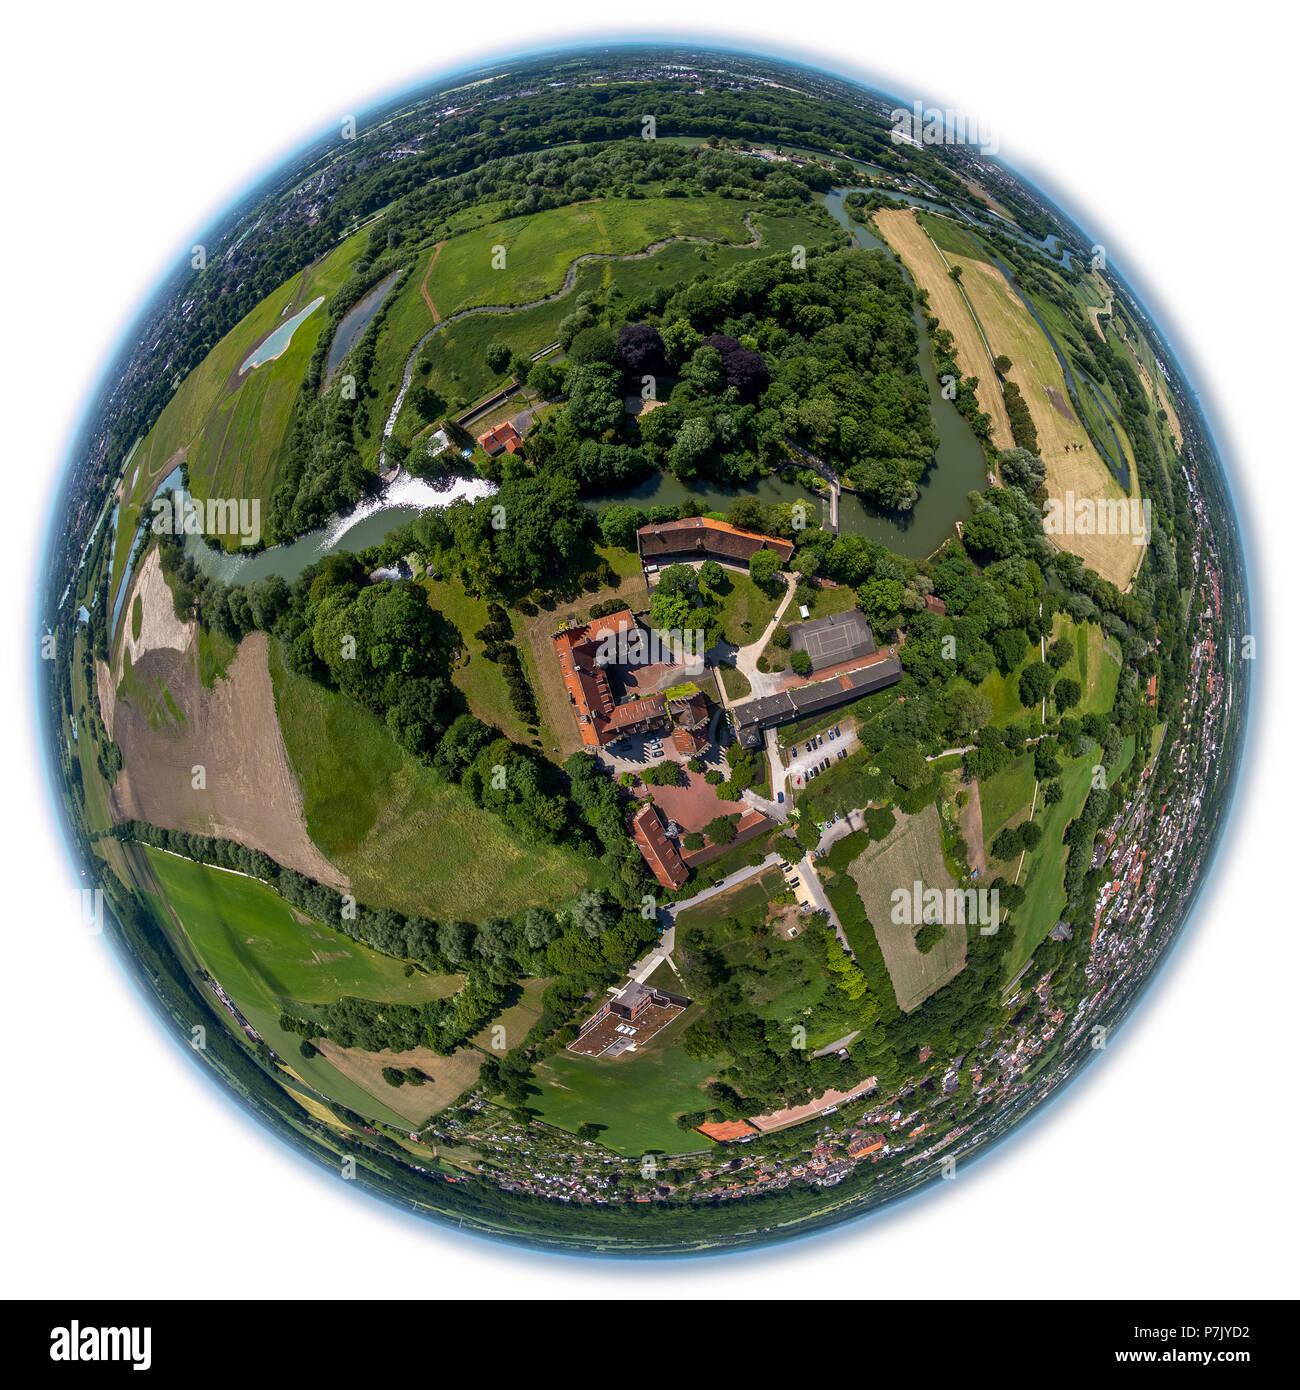 Castle Heessen, country hostel, boarding school, Lippeauen, nature reserve, fish eye image, vertical shot, Hamm, Ruhrgebiet, North Rhine-Westphalia, Germany - Stock Image